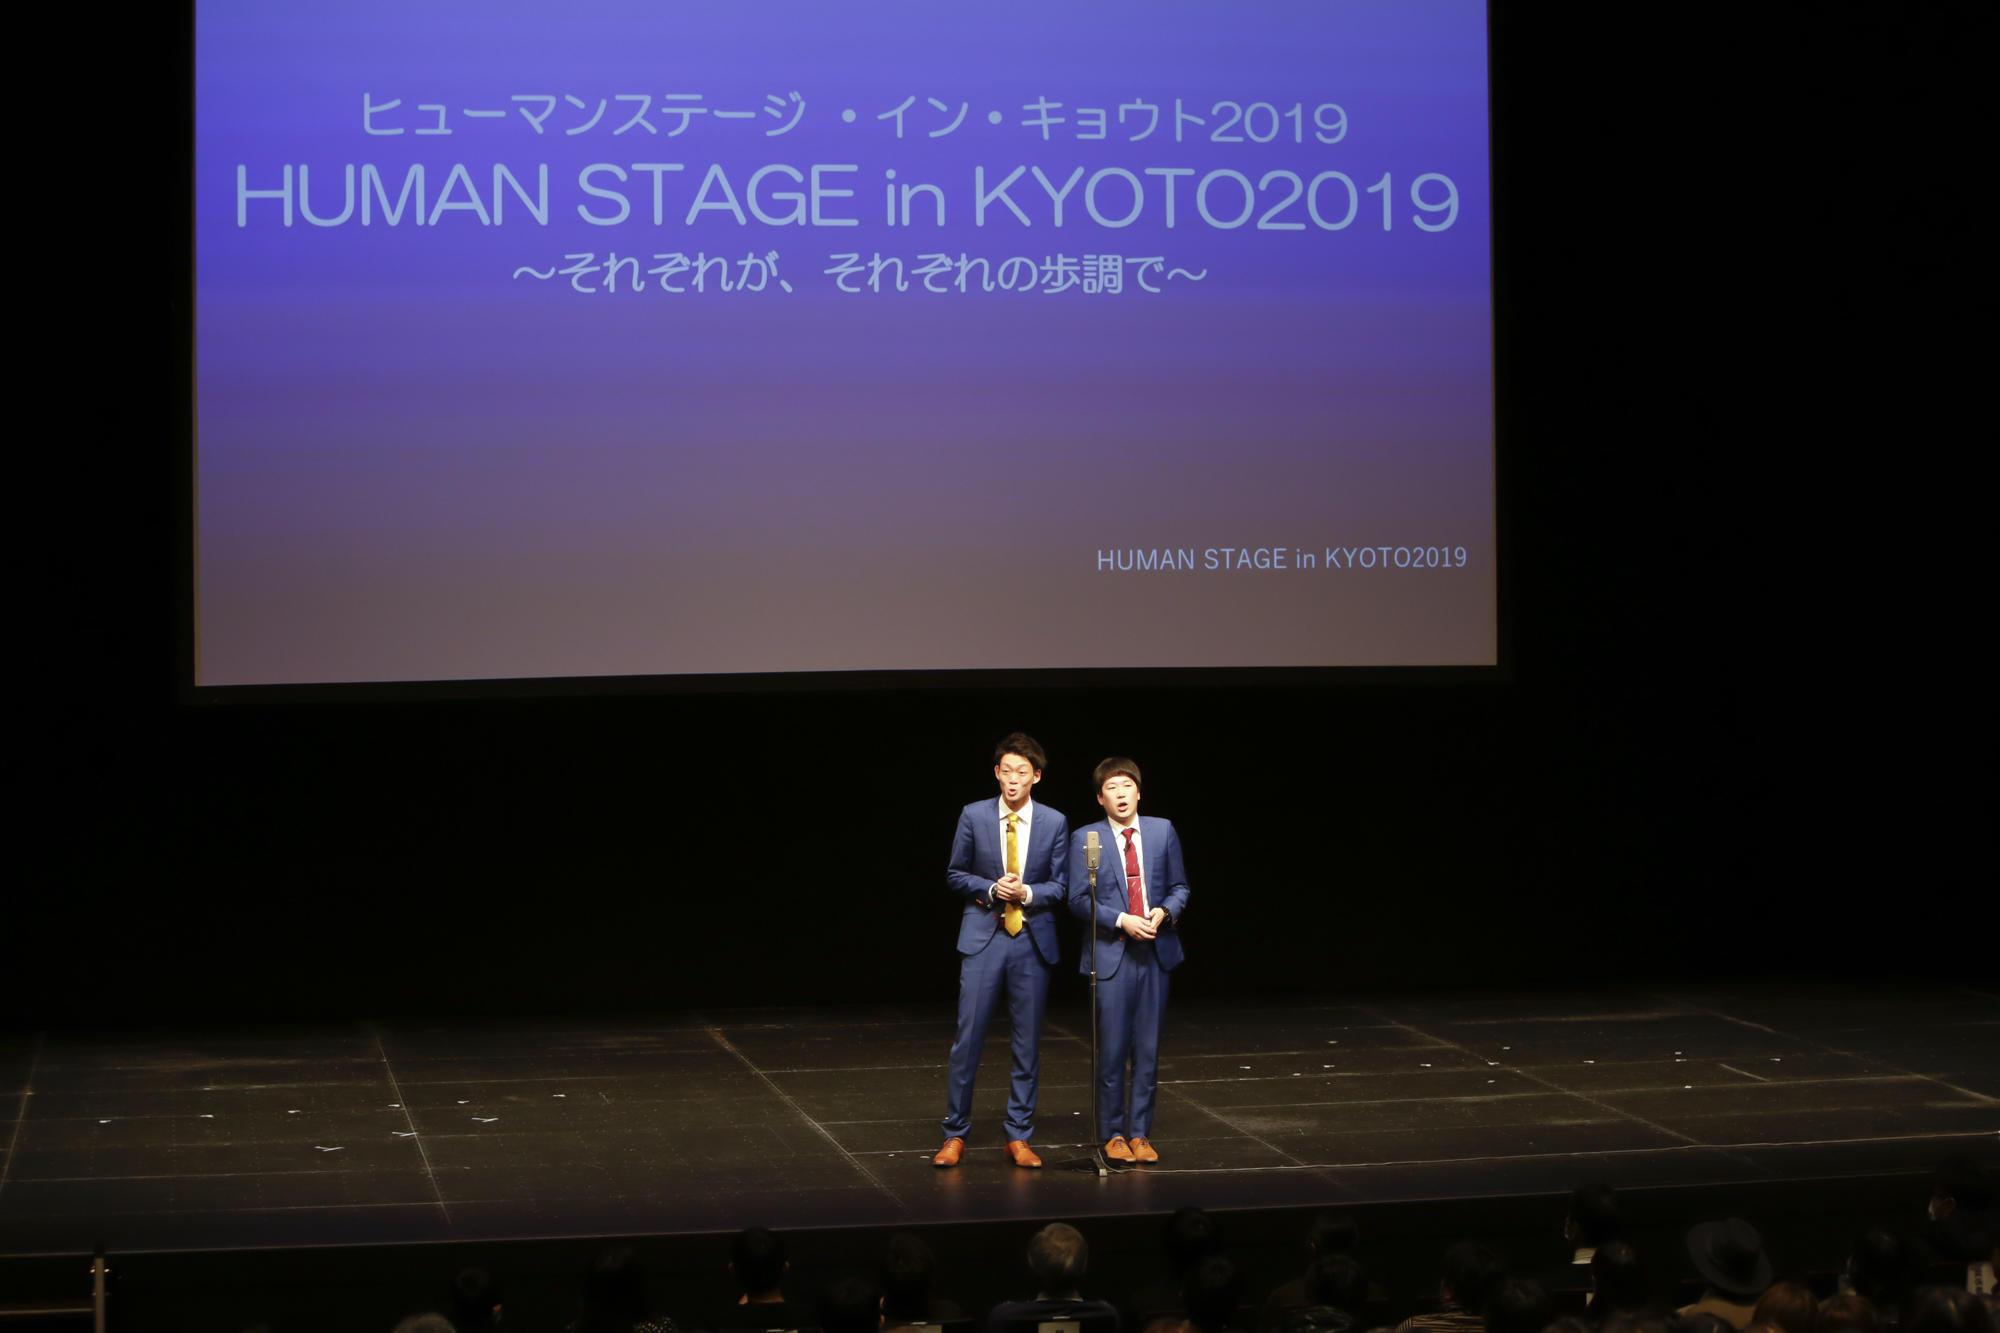 http://news.yoshimoto.co.jp/20190128143235-1df9cde85c60b9a039737518440058f6b88f574d.jpg